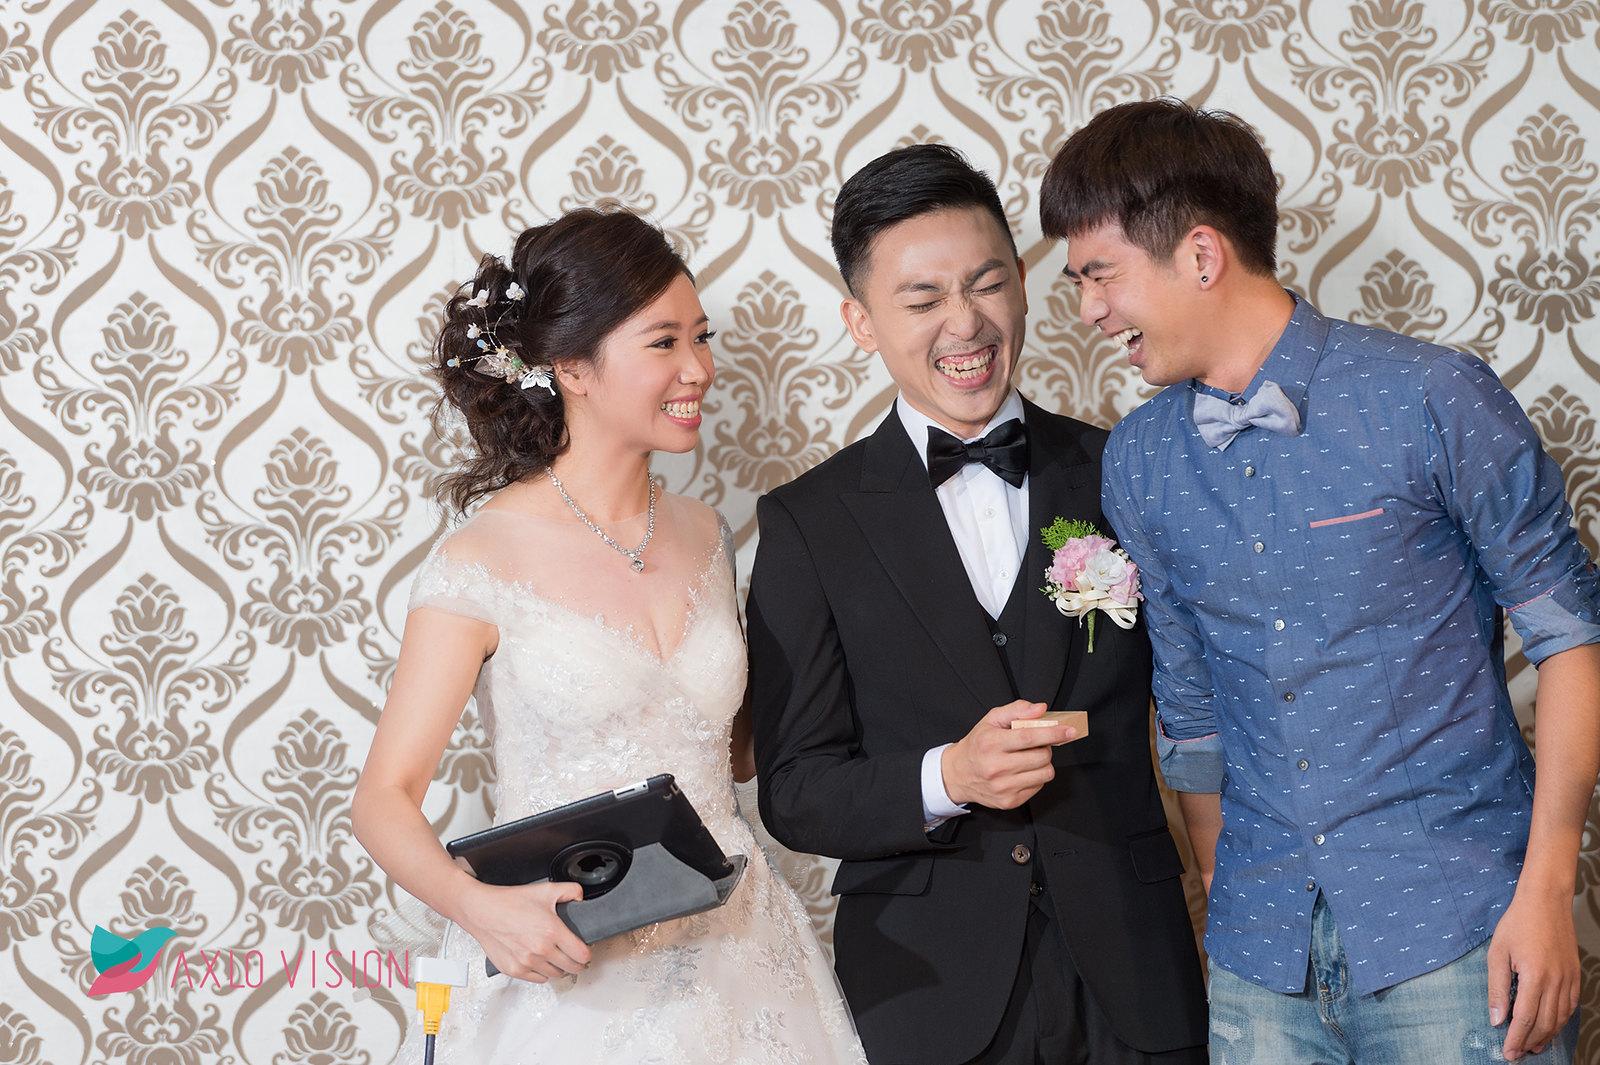 20170916 WeddingDay_153